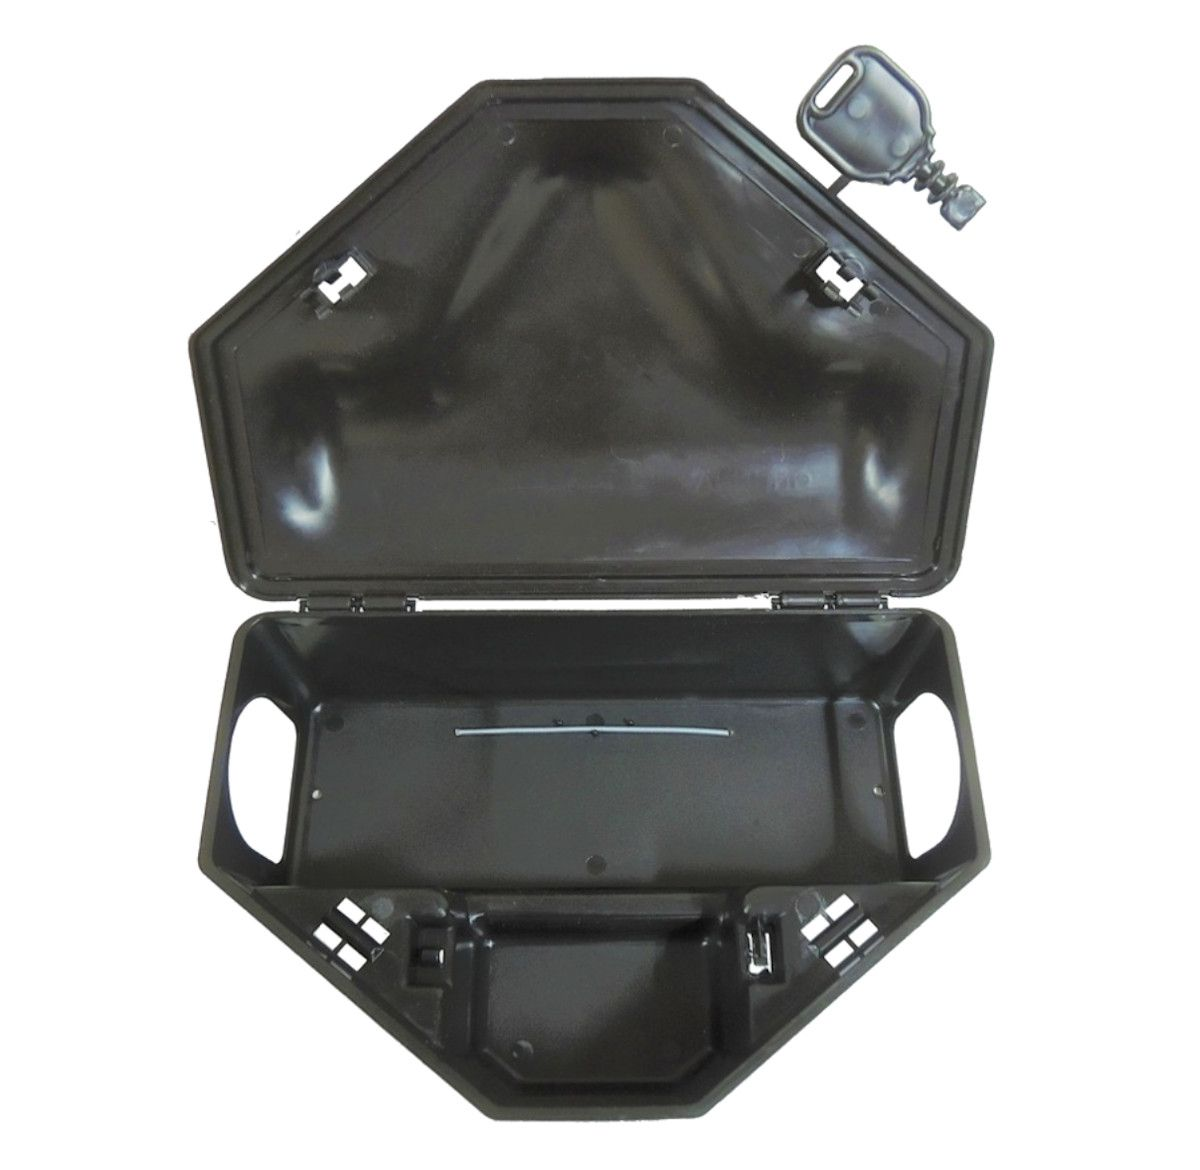 Kit 24 Porta Isca C/2 Chaves + 24 Bloco Extrusado Mata Seca